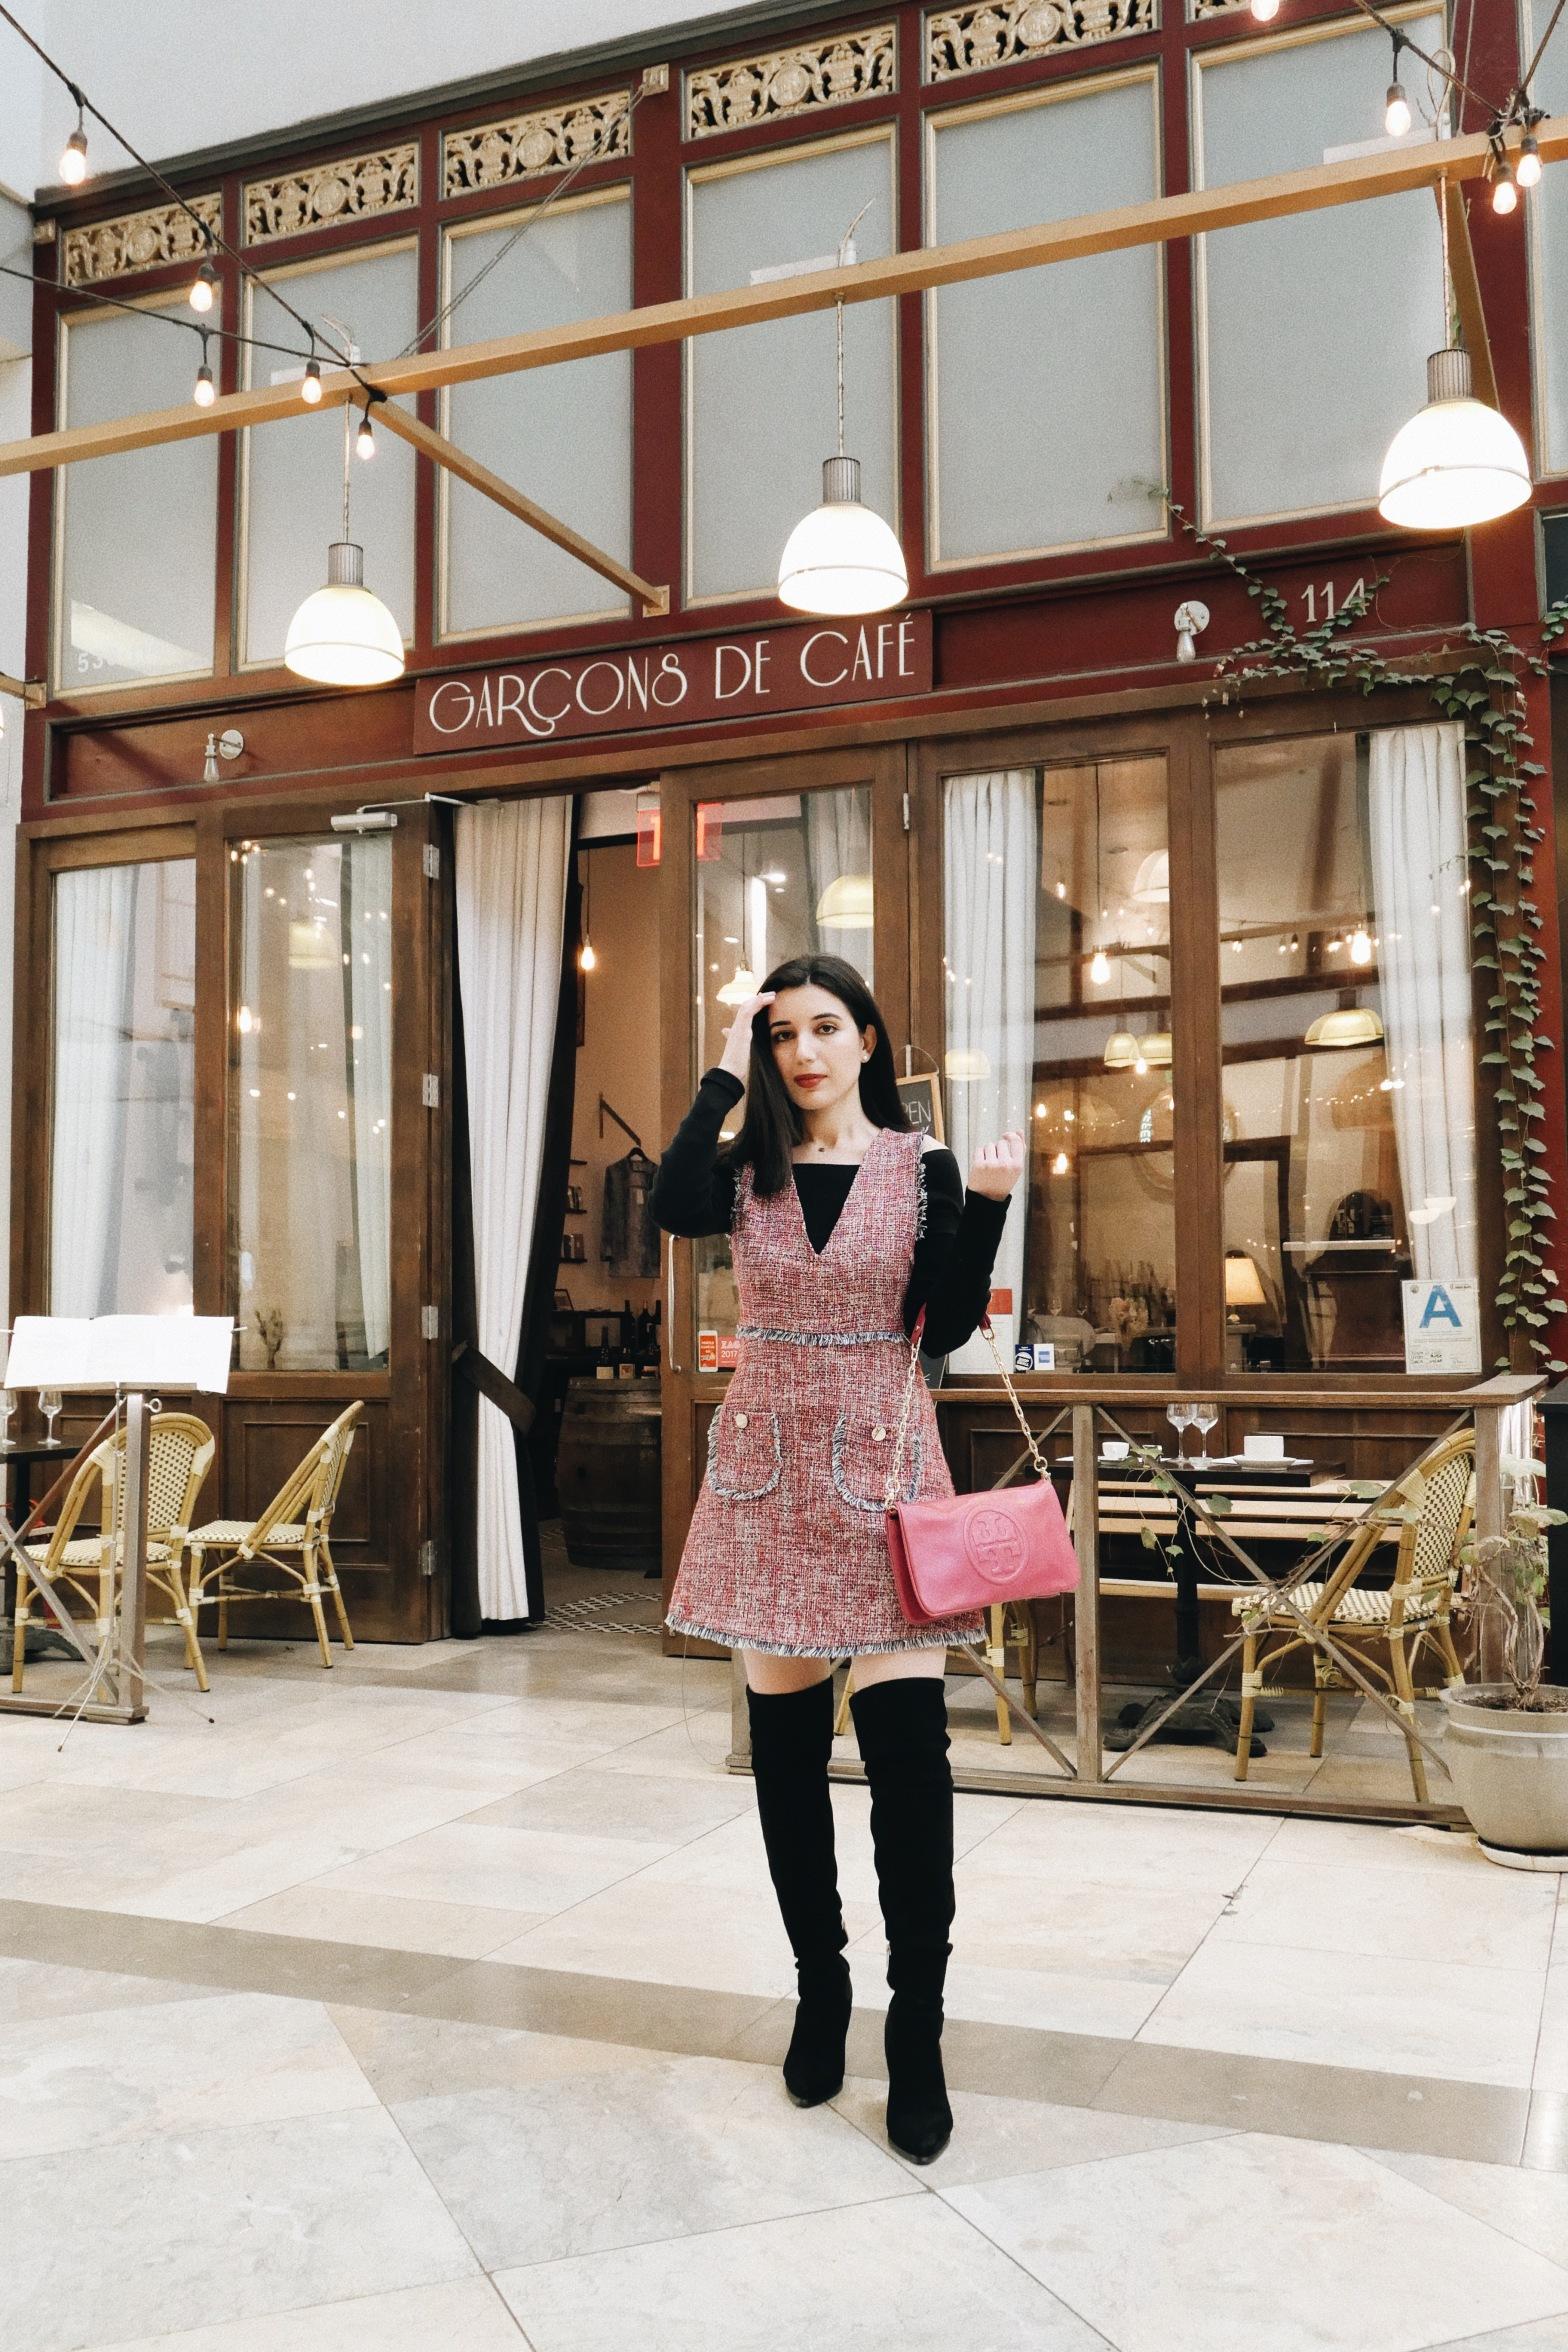 Garçons de Café, Spring Street Arcade, Downtown Los Angeles, LA city guide, Los Angeles restaurants, Best Los Angeles restaurants, cafe, cafe style, coffee shop, Los Angeles coffee shops, LA eats, tweed, Zara, Tory Burch purse, pink outfit